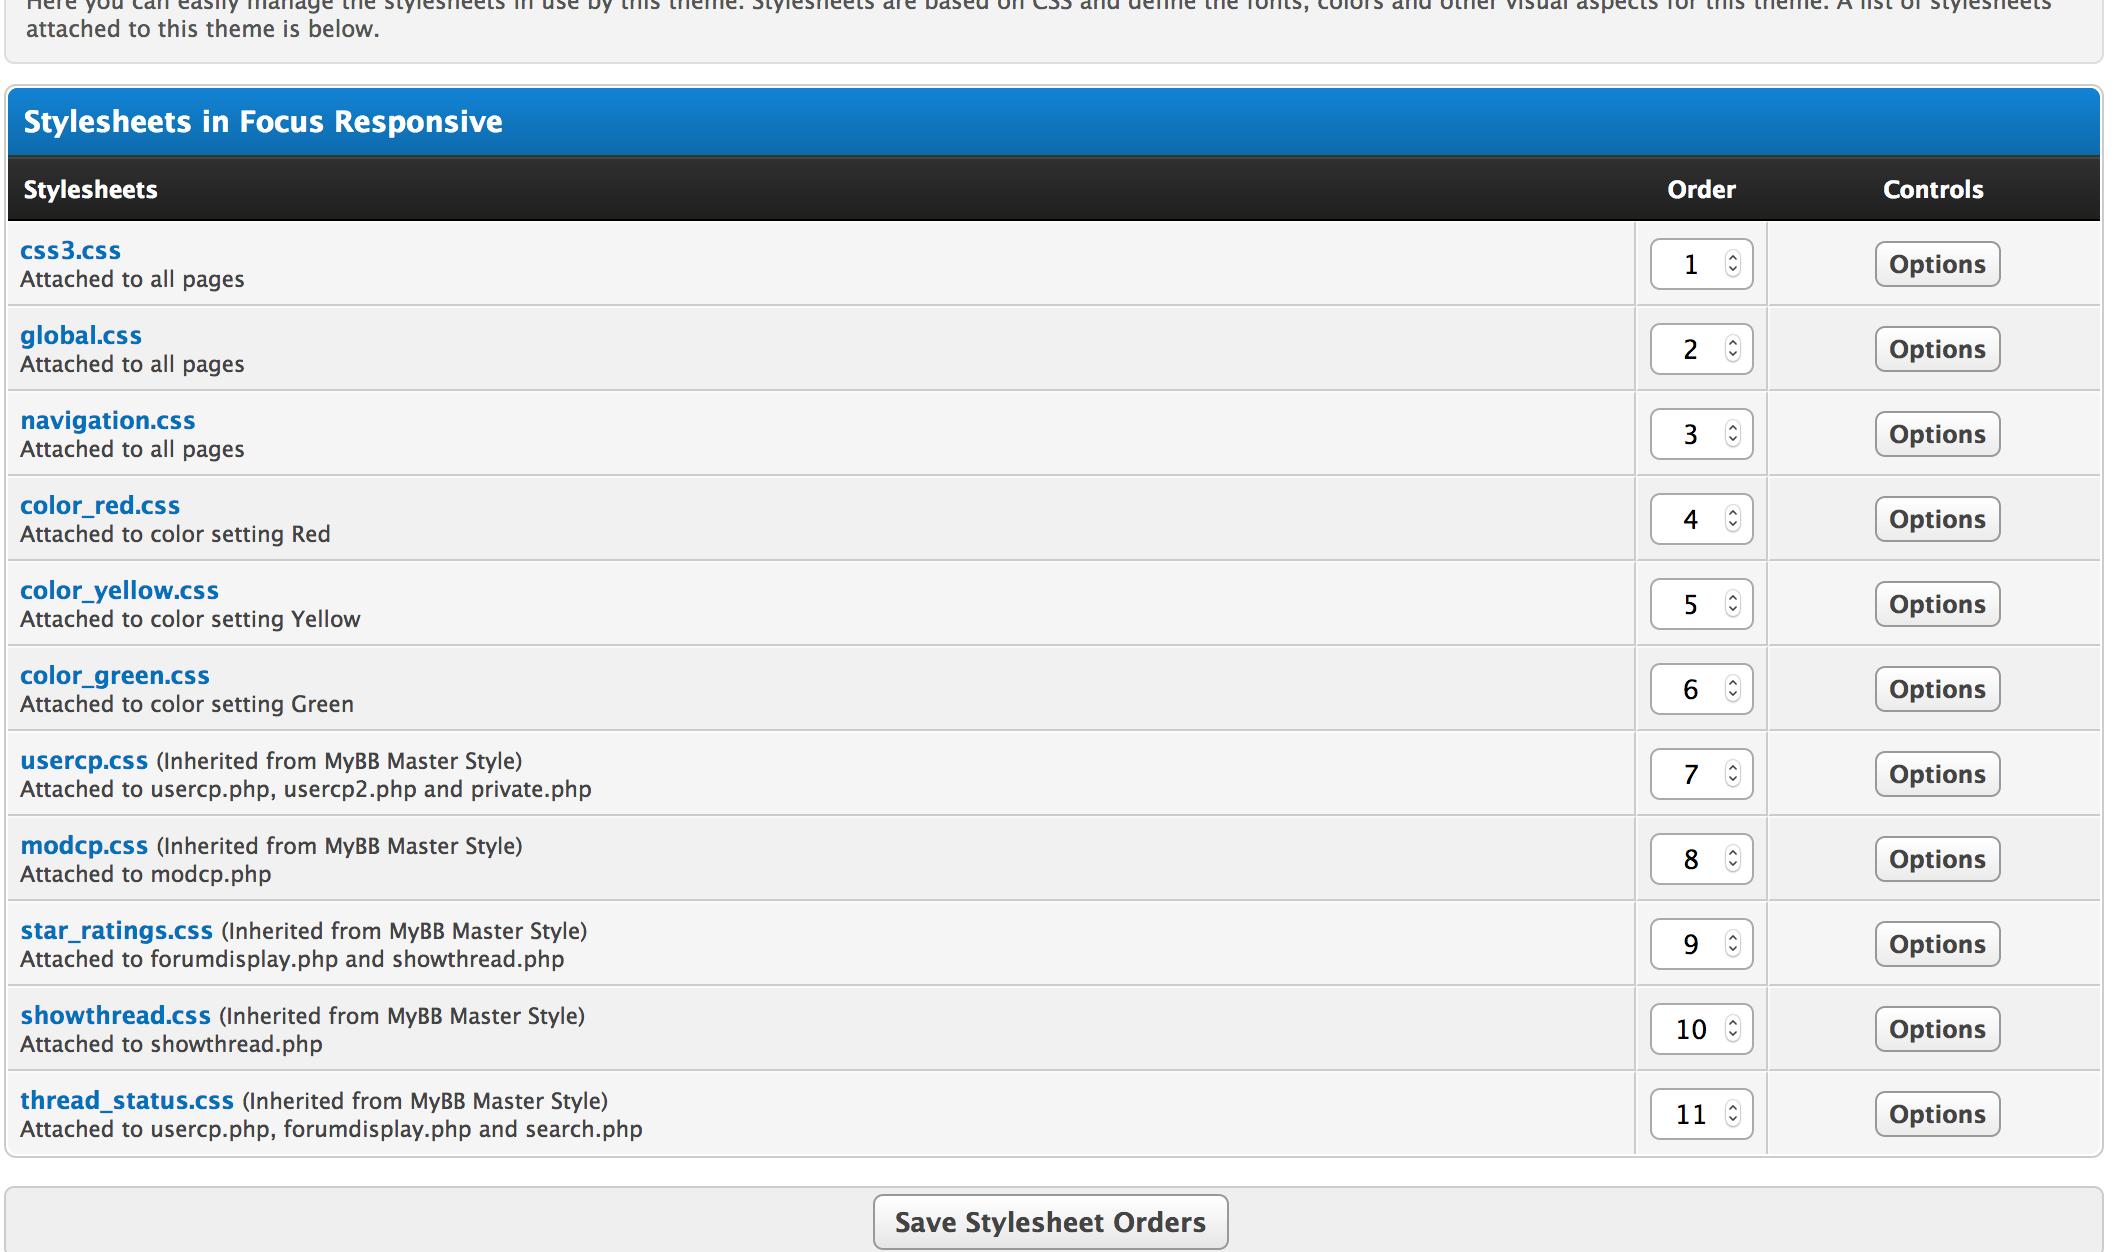 MyBB theme stylesheets order